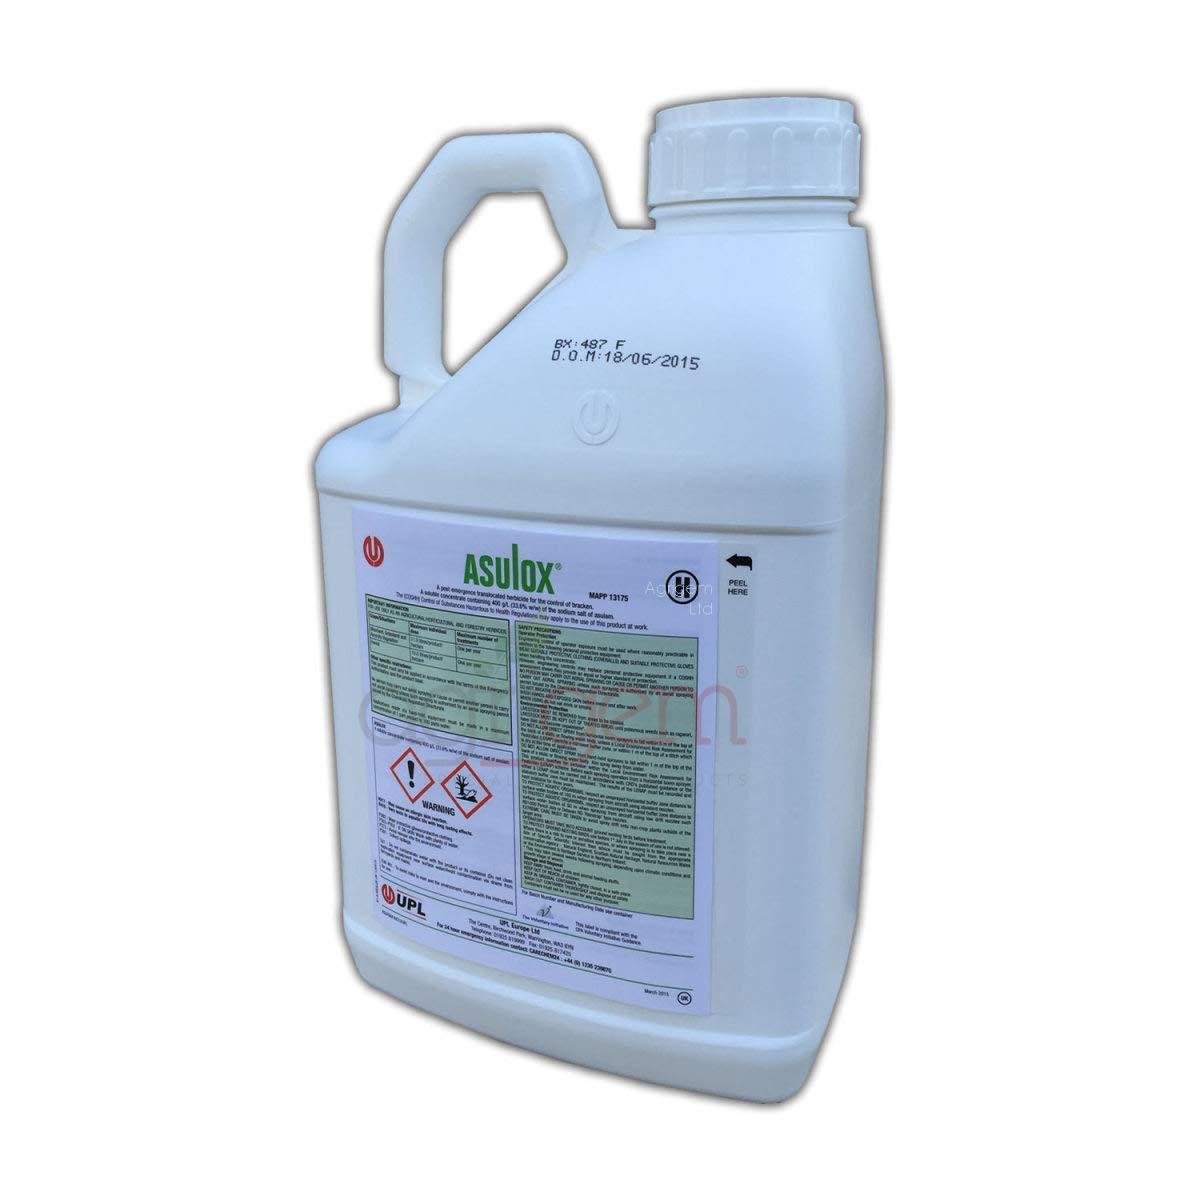 UPL IPI ASULOX 2 5 Gallon